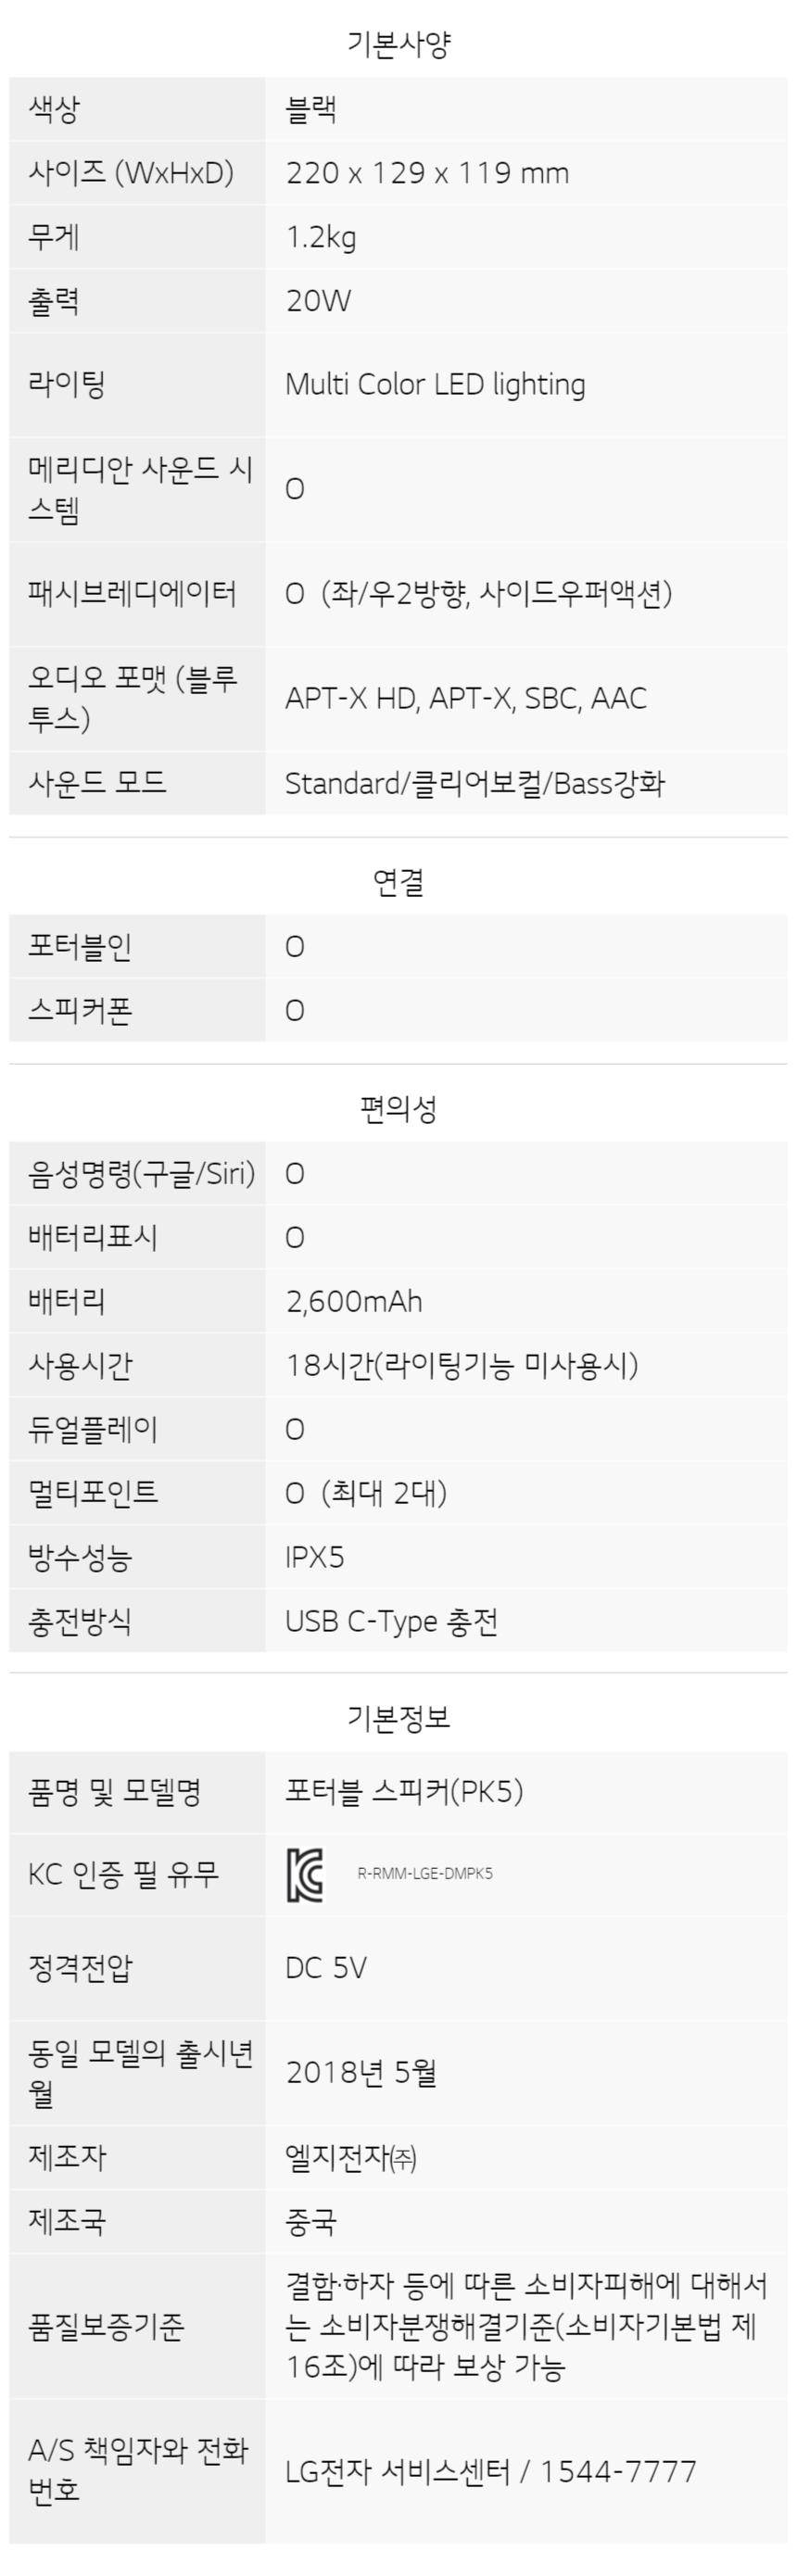 PK5 제품 사양